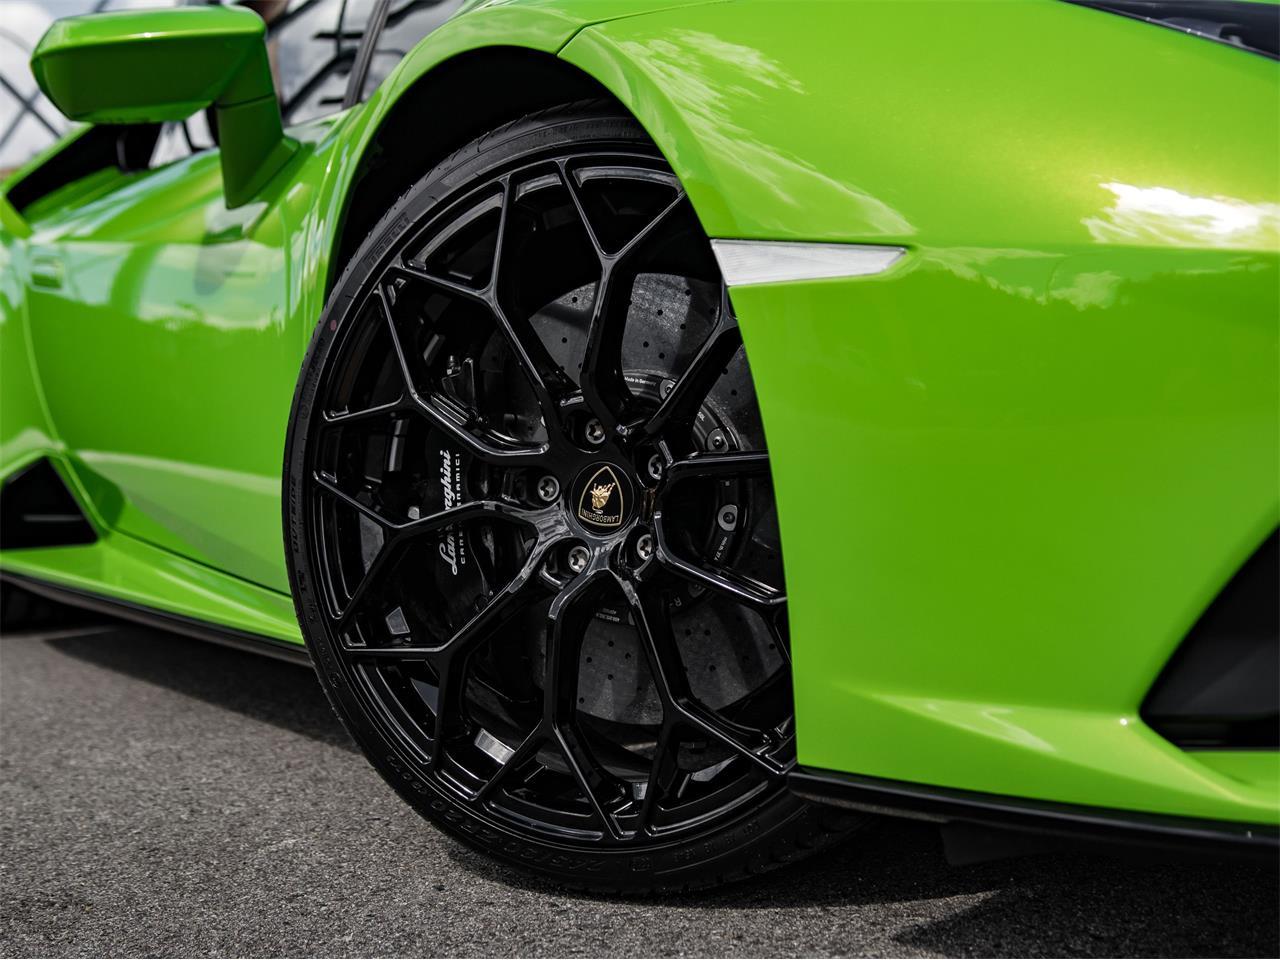 2020 Lamborghini Huracan (CC-1387777) for sale in Kelowna, British Columbia